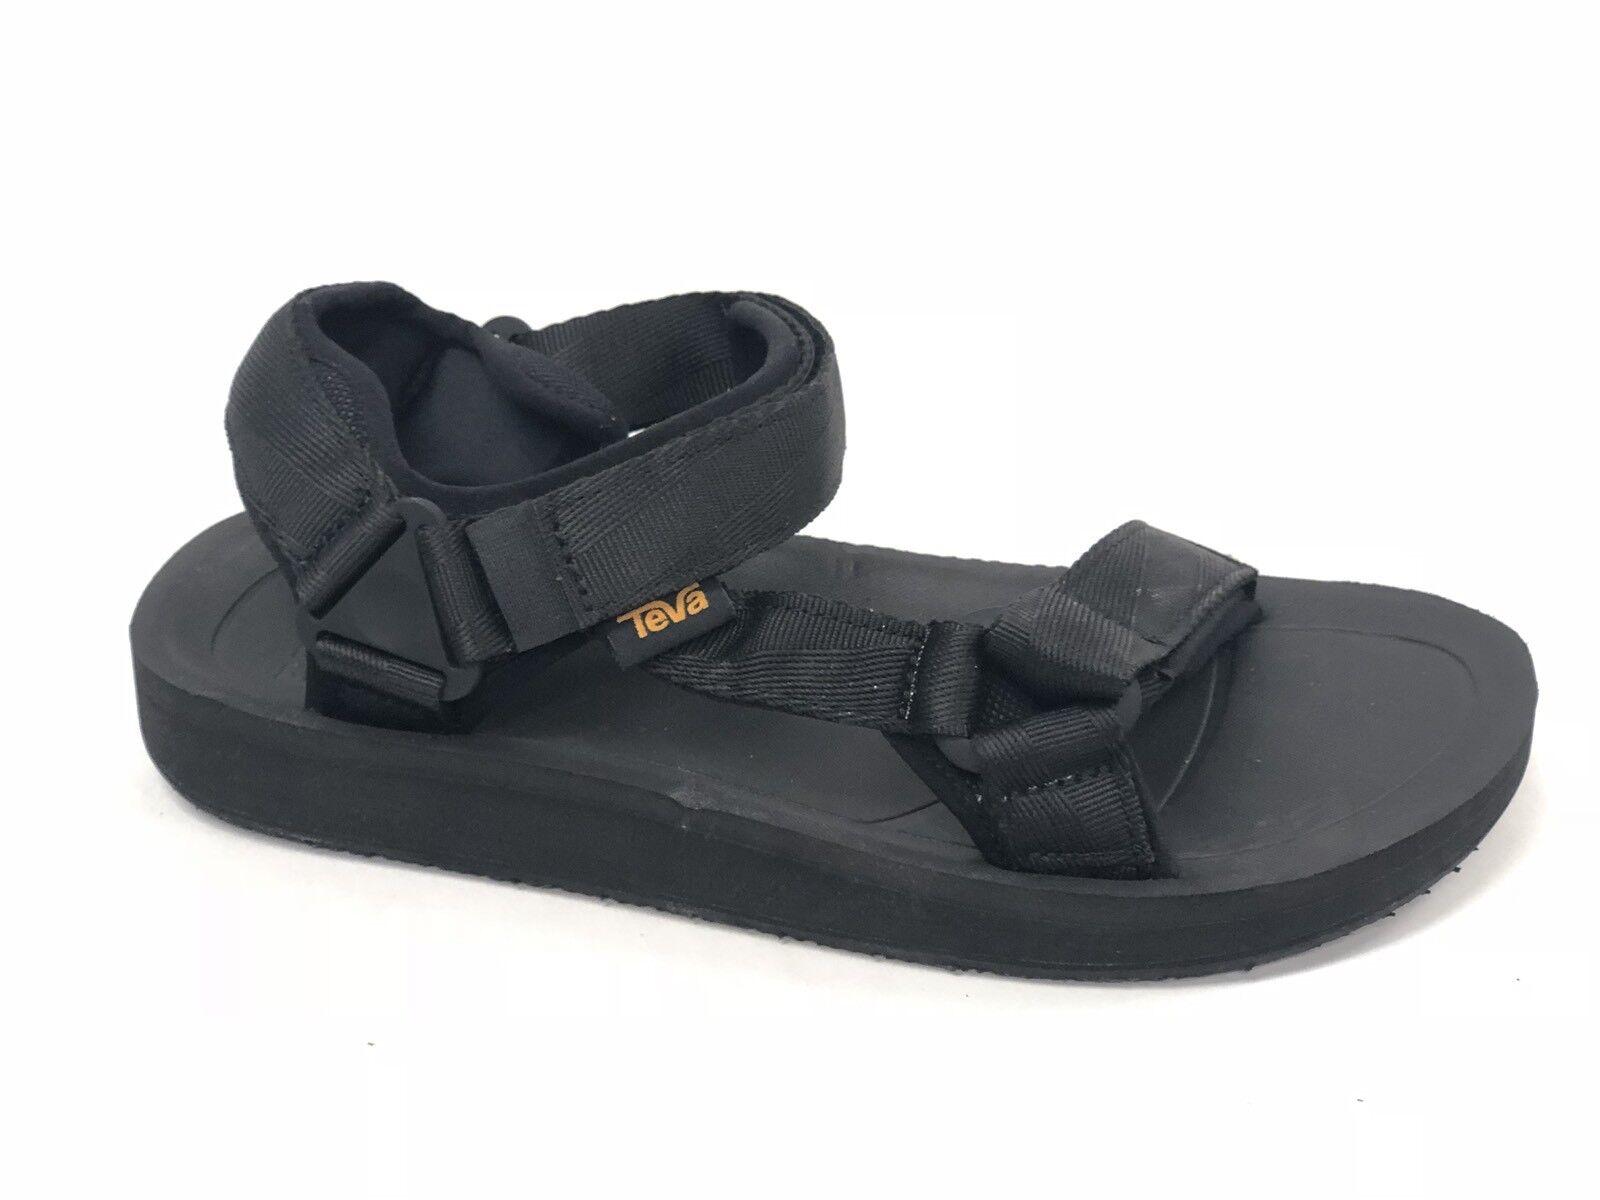 Teva Men's Original BLACK Universal Premier Casual Sandals 1015192 BLACK Original Webbing New 566859